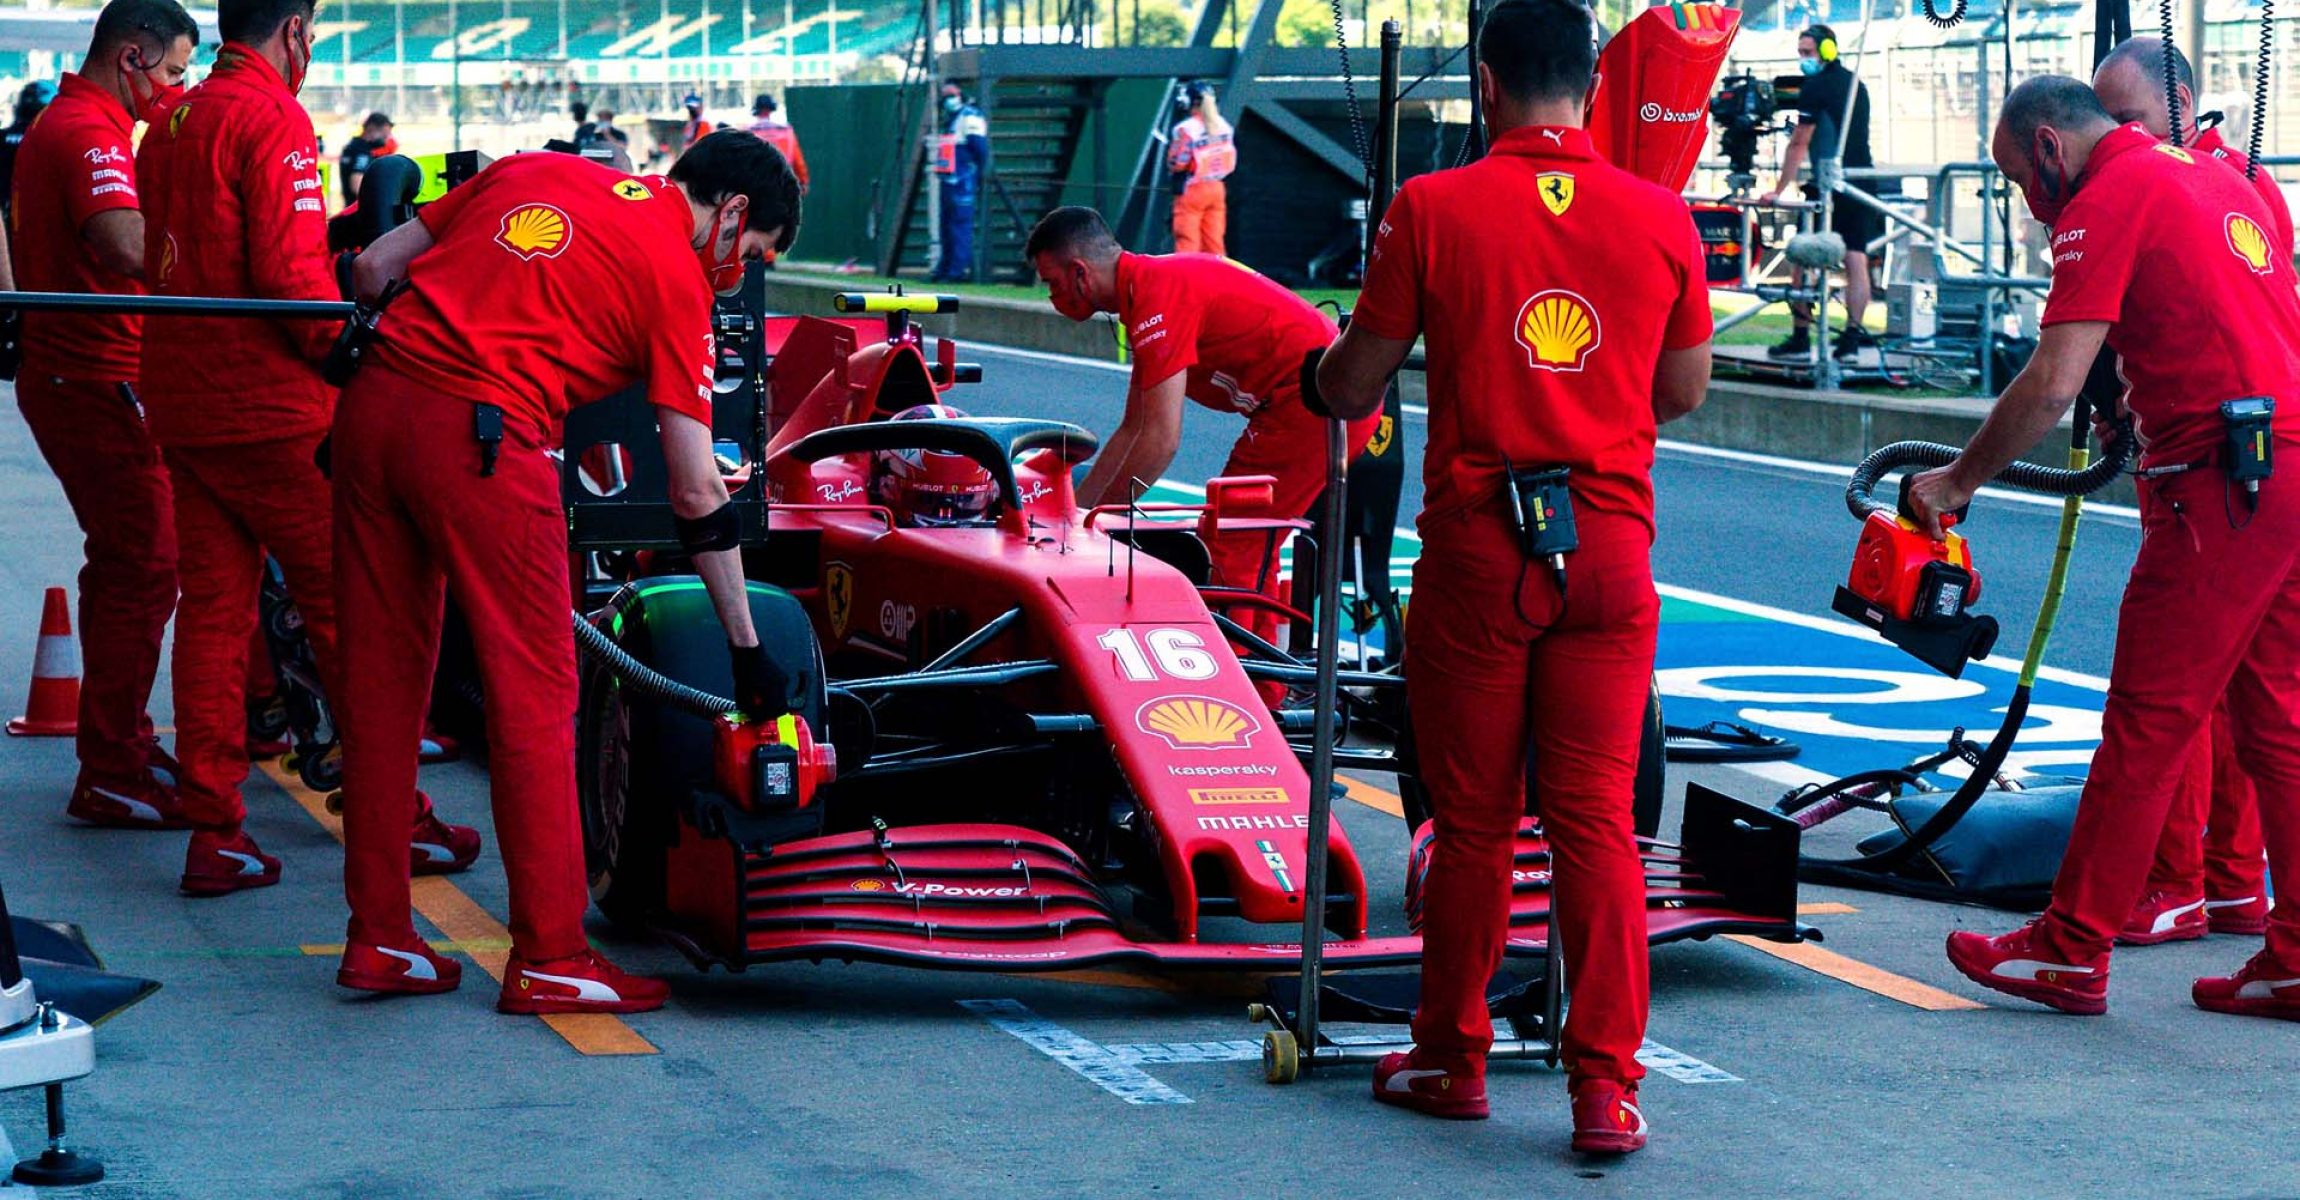 GP GRAN BRETAGNA F1/2020 - VENERDÌ 31/07/2020 credit: @Scuderia Ferrari Press Office Charles Leclerc